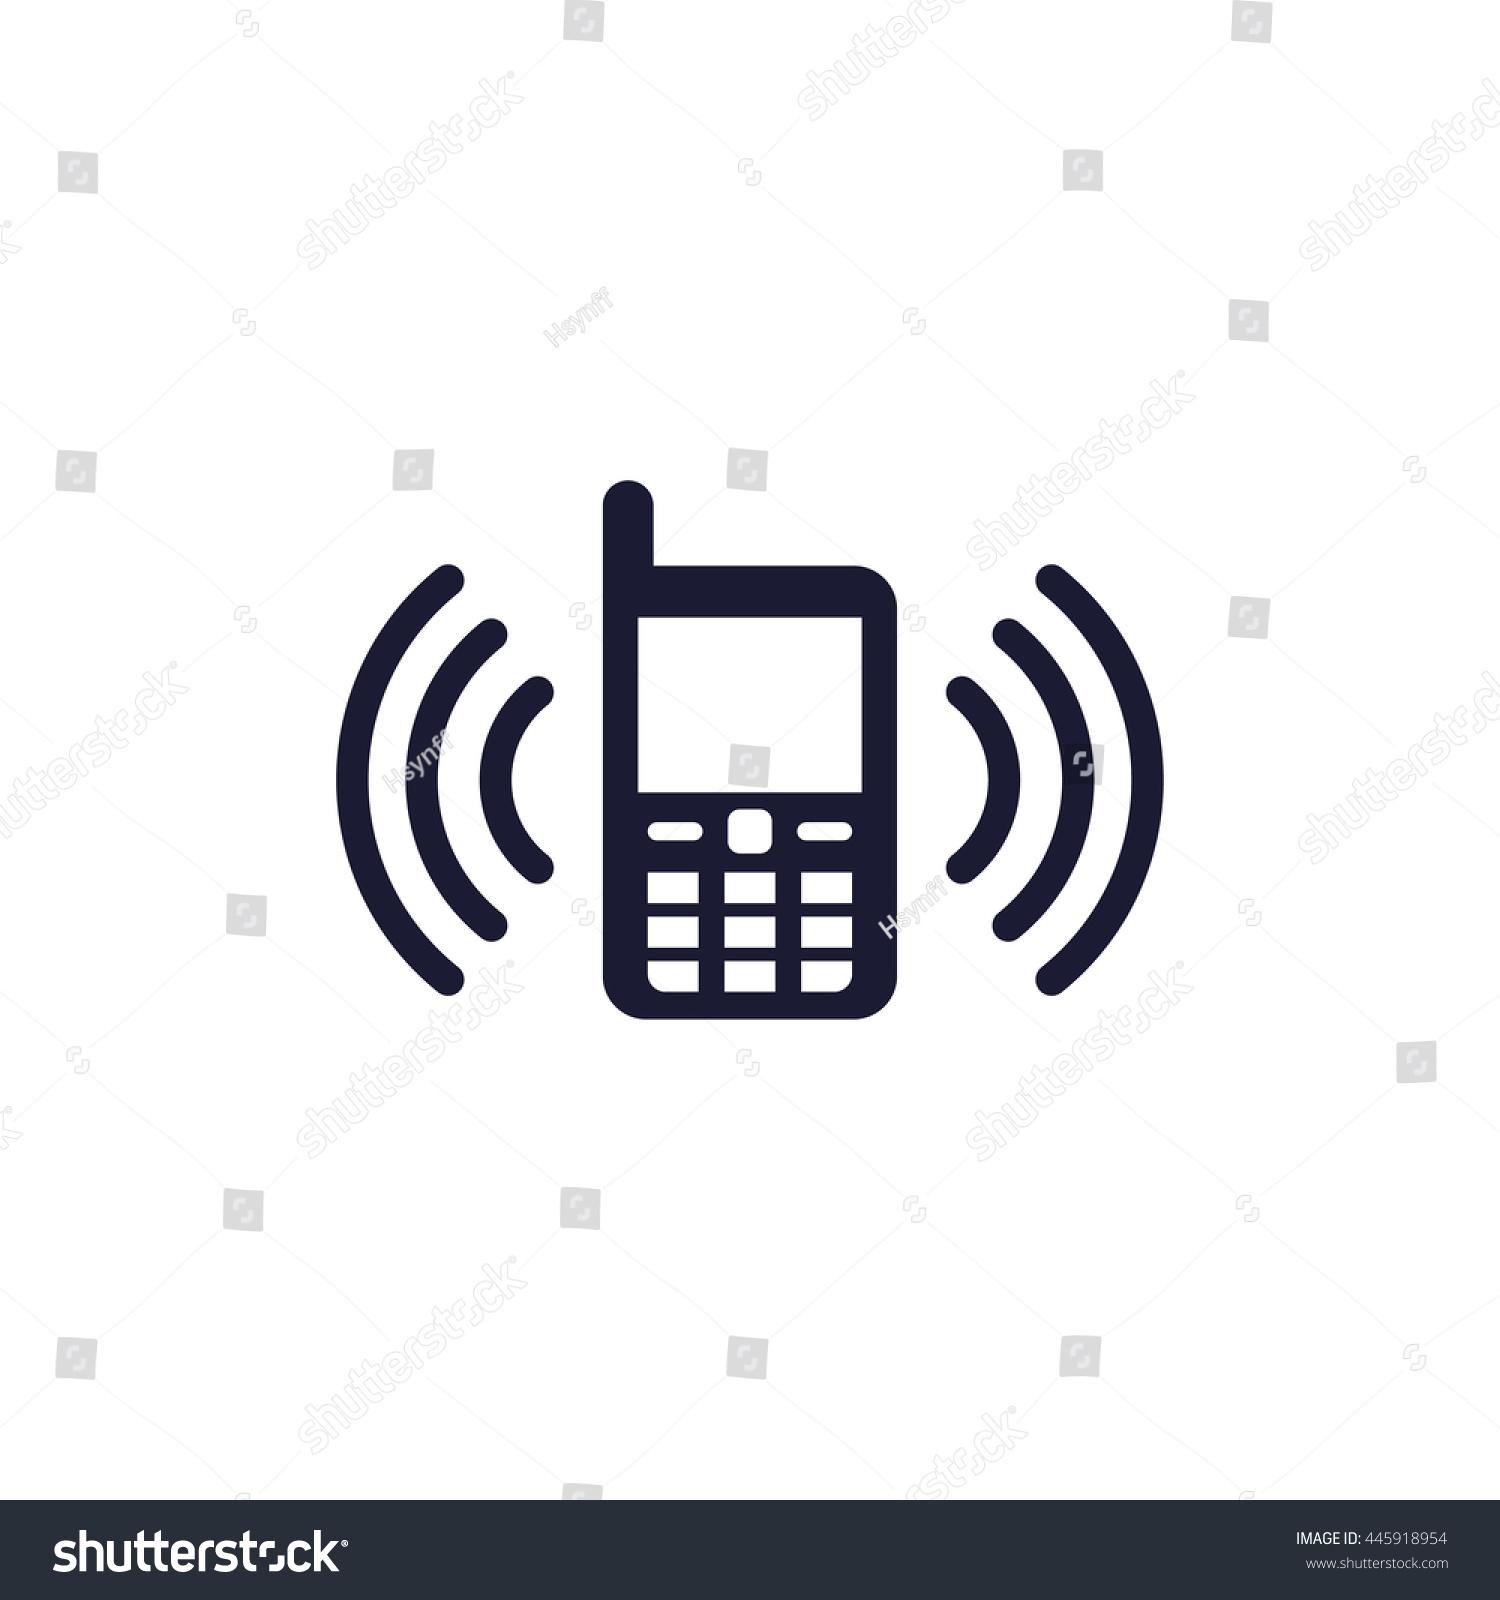 Phone Vibration Icon Stock Vector 445918954 - Shutterstock